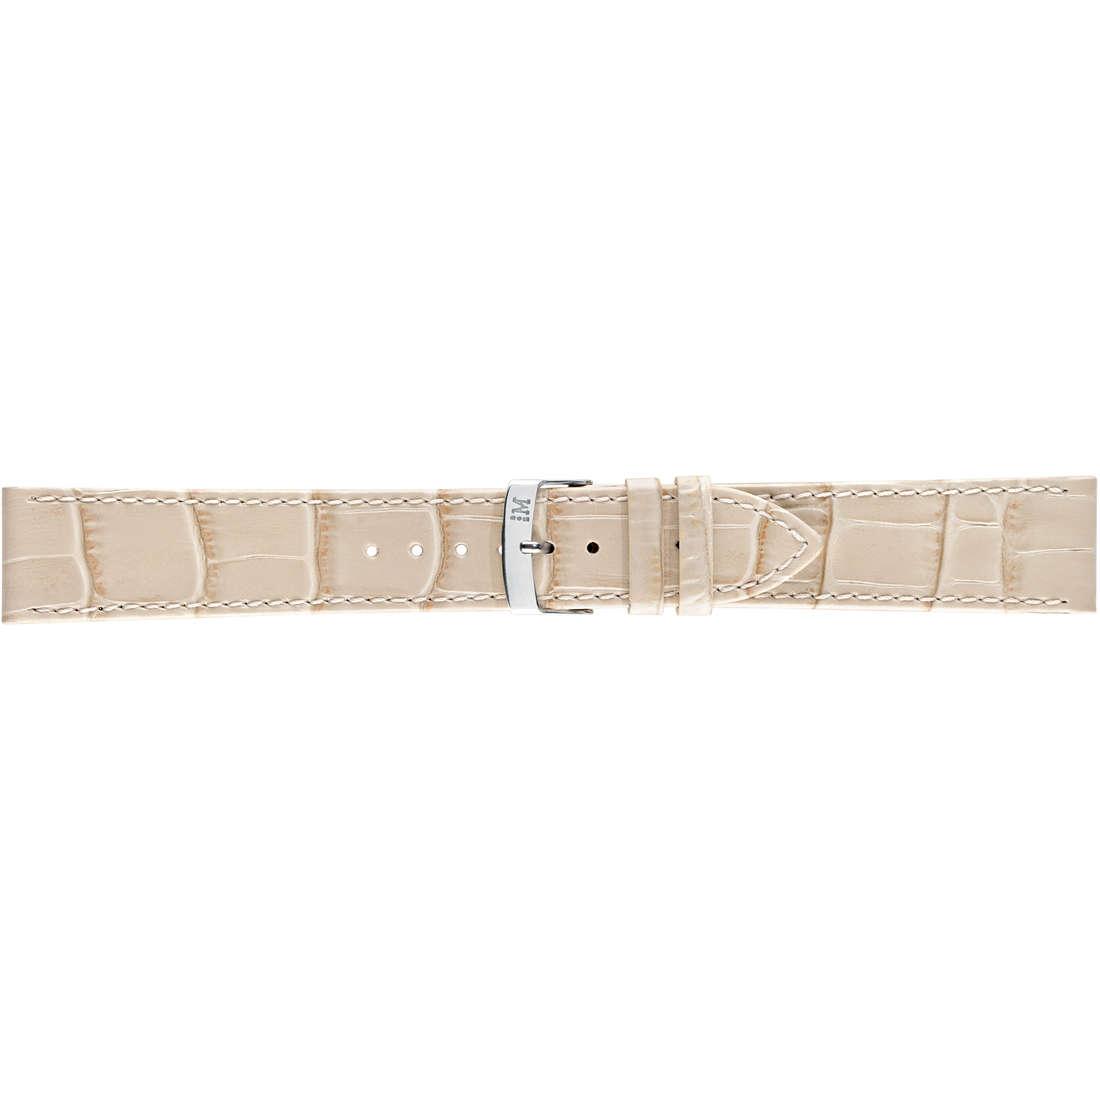 montre bande de montres homme Morellato Performance A01X2524656326CR16